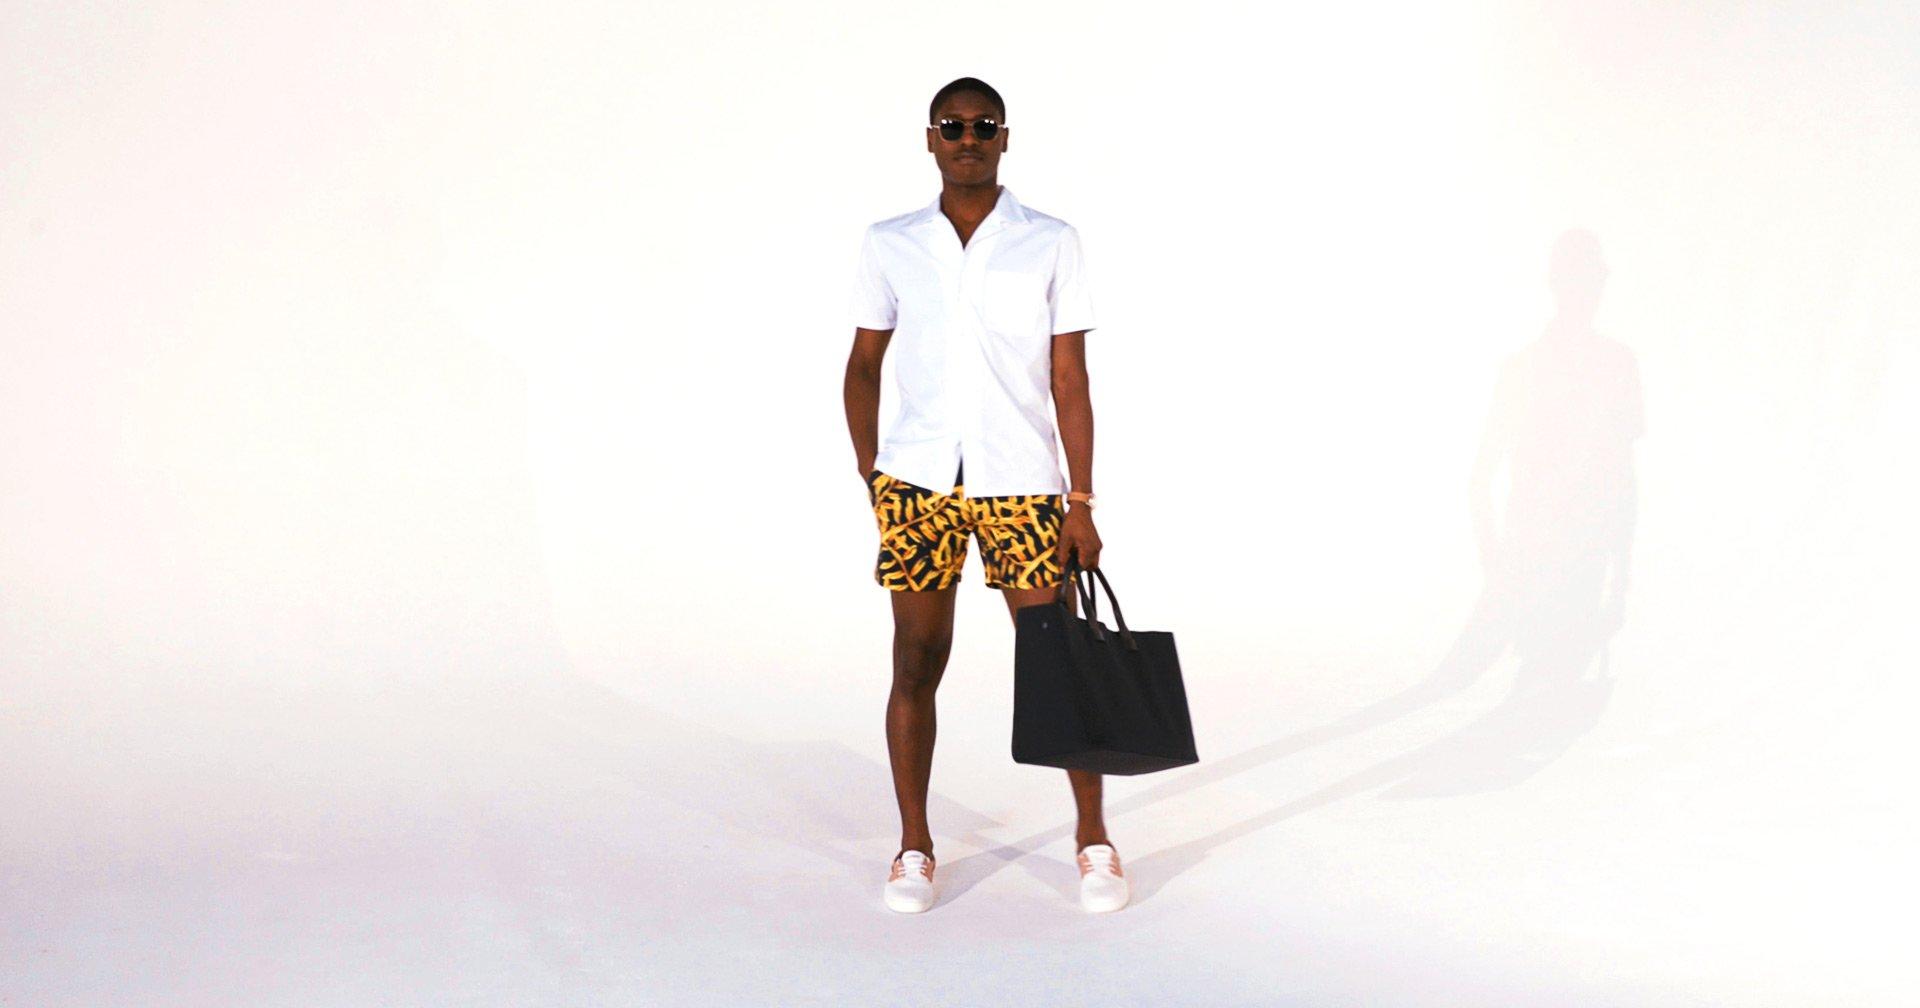 Get Dressed Better, Pt. 7: The Poolside